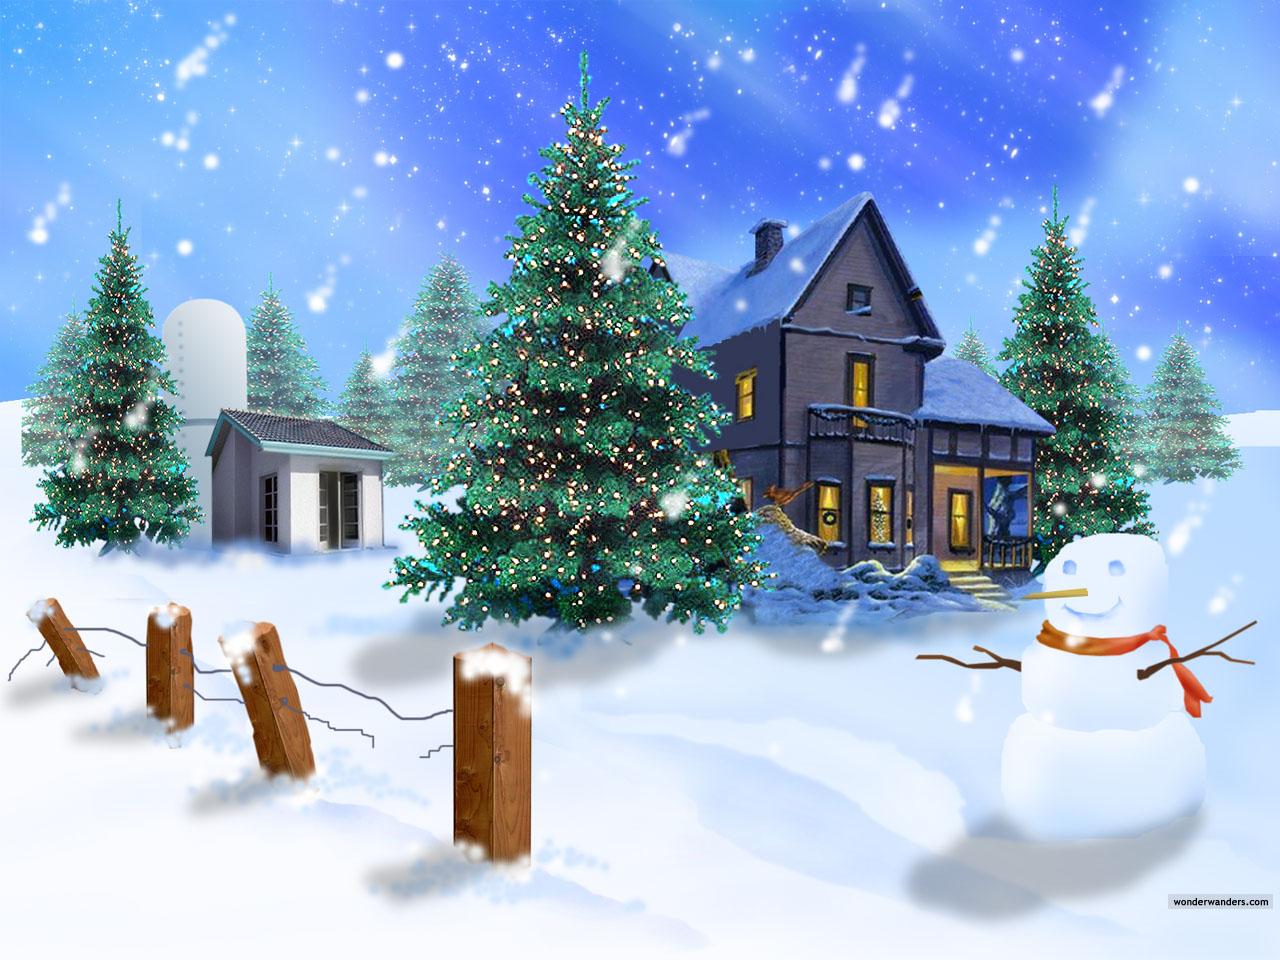 3D Christmas Wallpaper HD HD Wallpapers Backgrounds Photos 1280x960